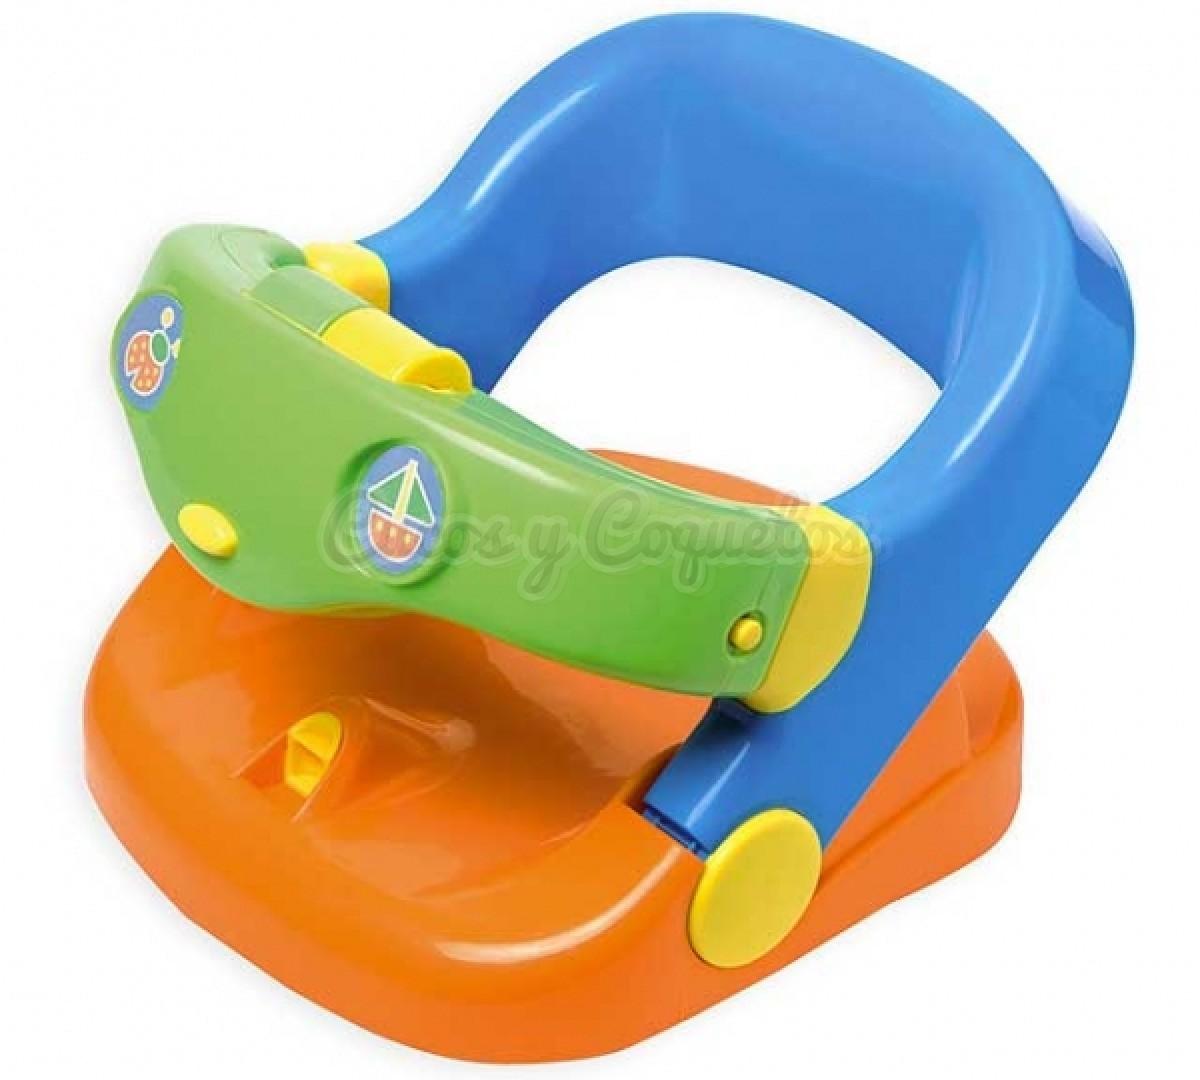 Baño Infantil Mustela:Soporte de baño giratorio